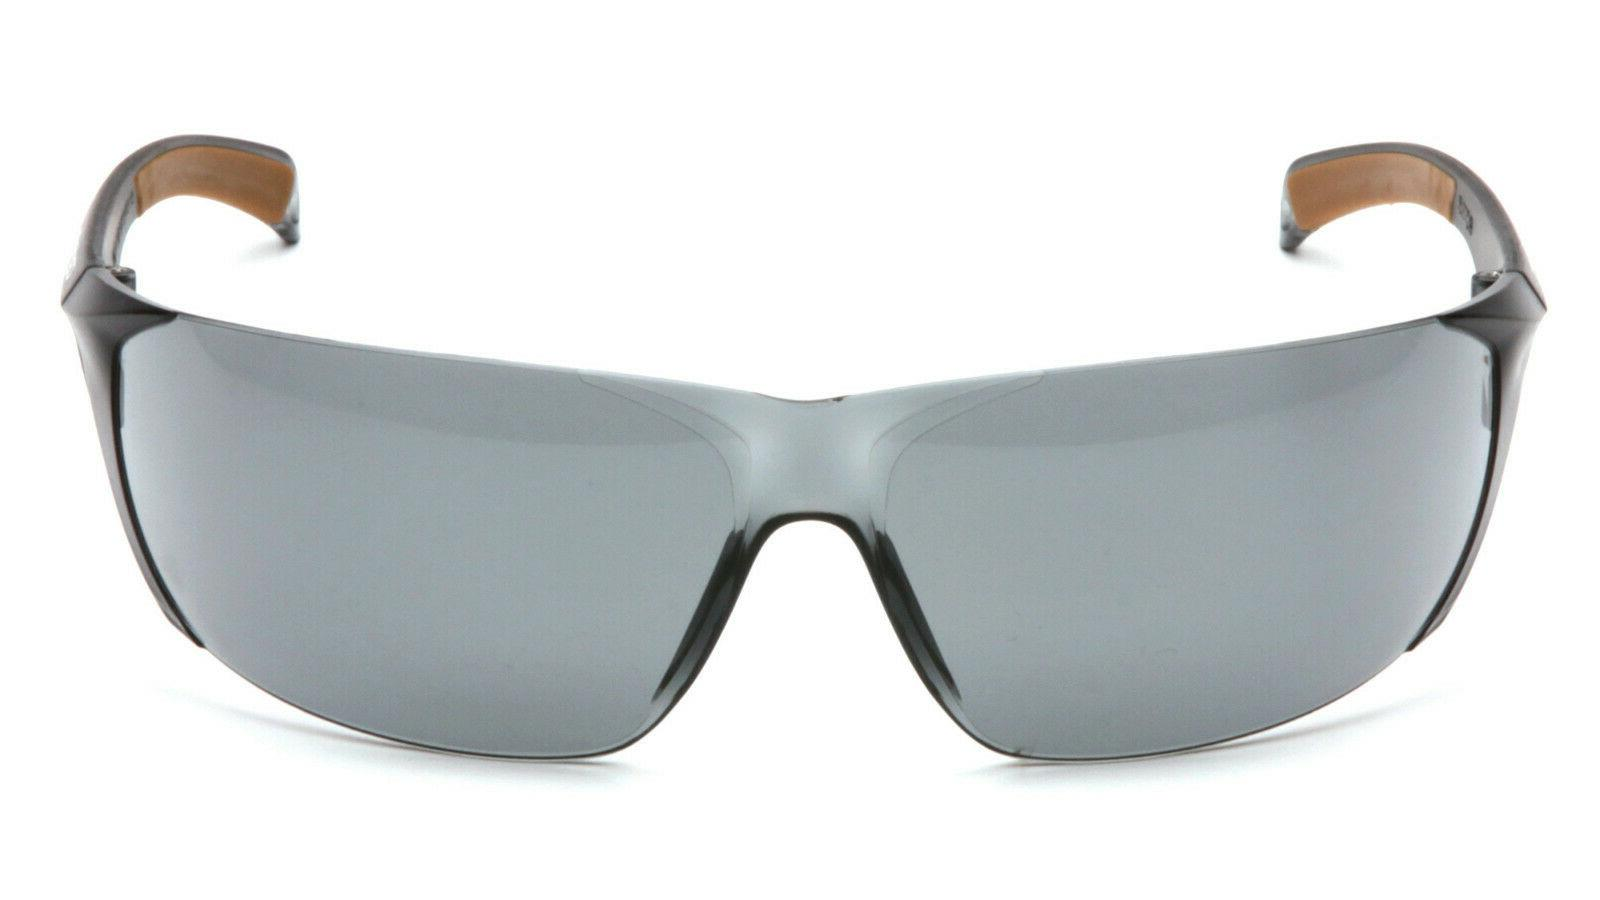 Carhartt Fog Safety Glasses Z87+